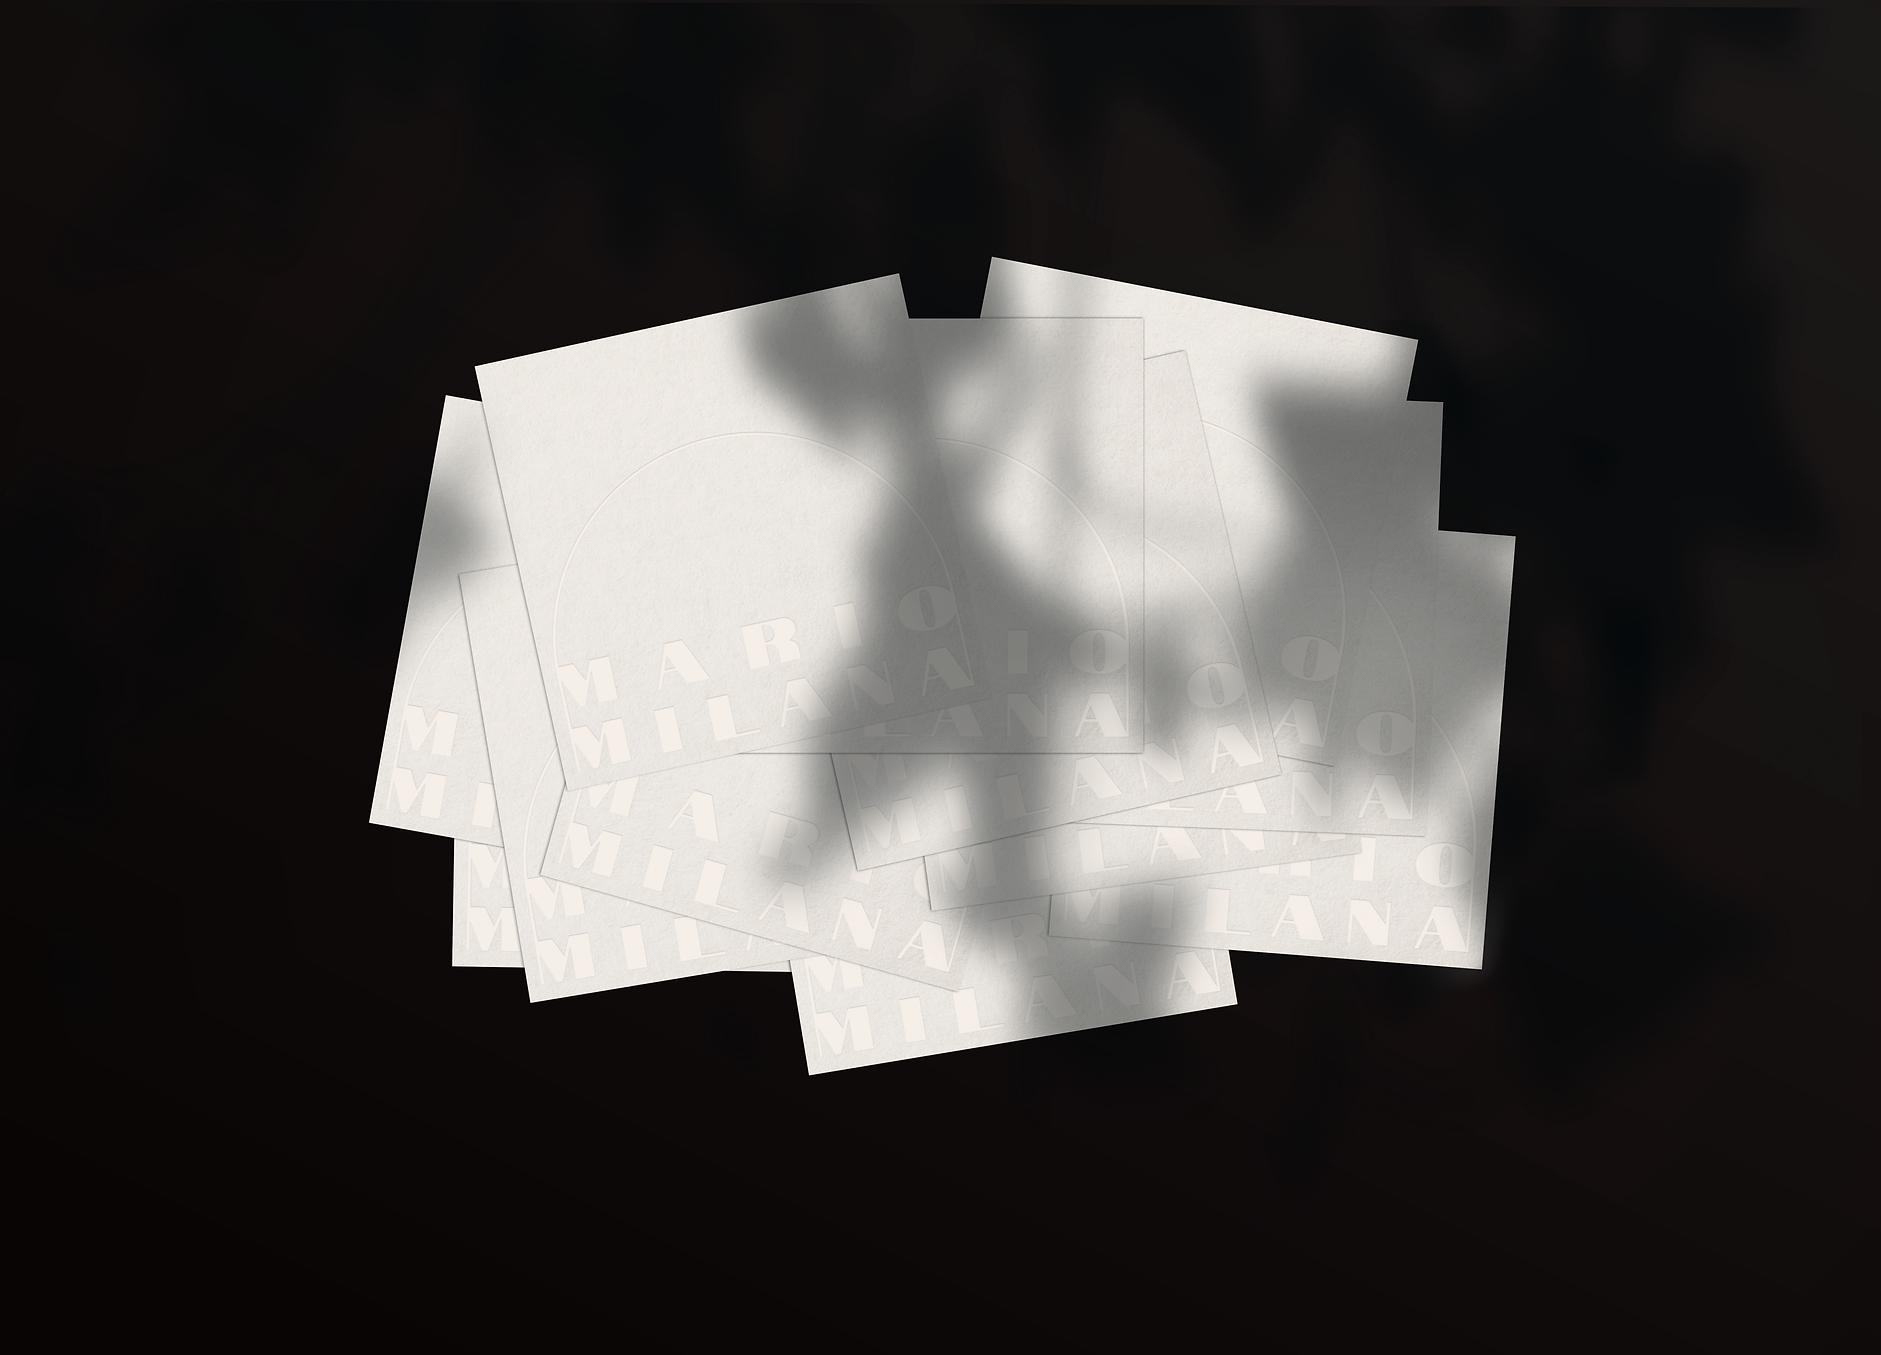 Mario-Stationary-black-card.png